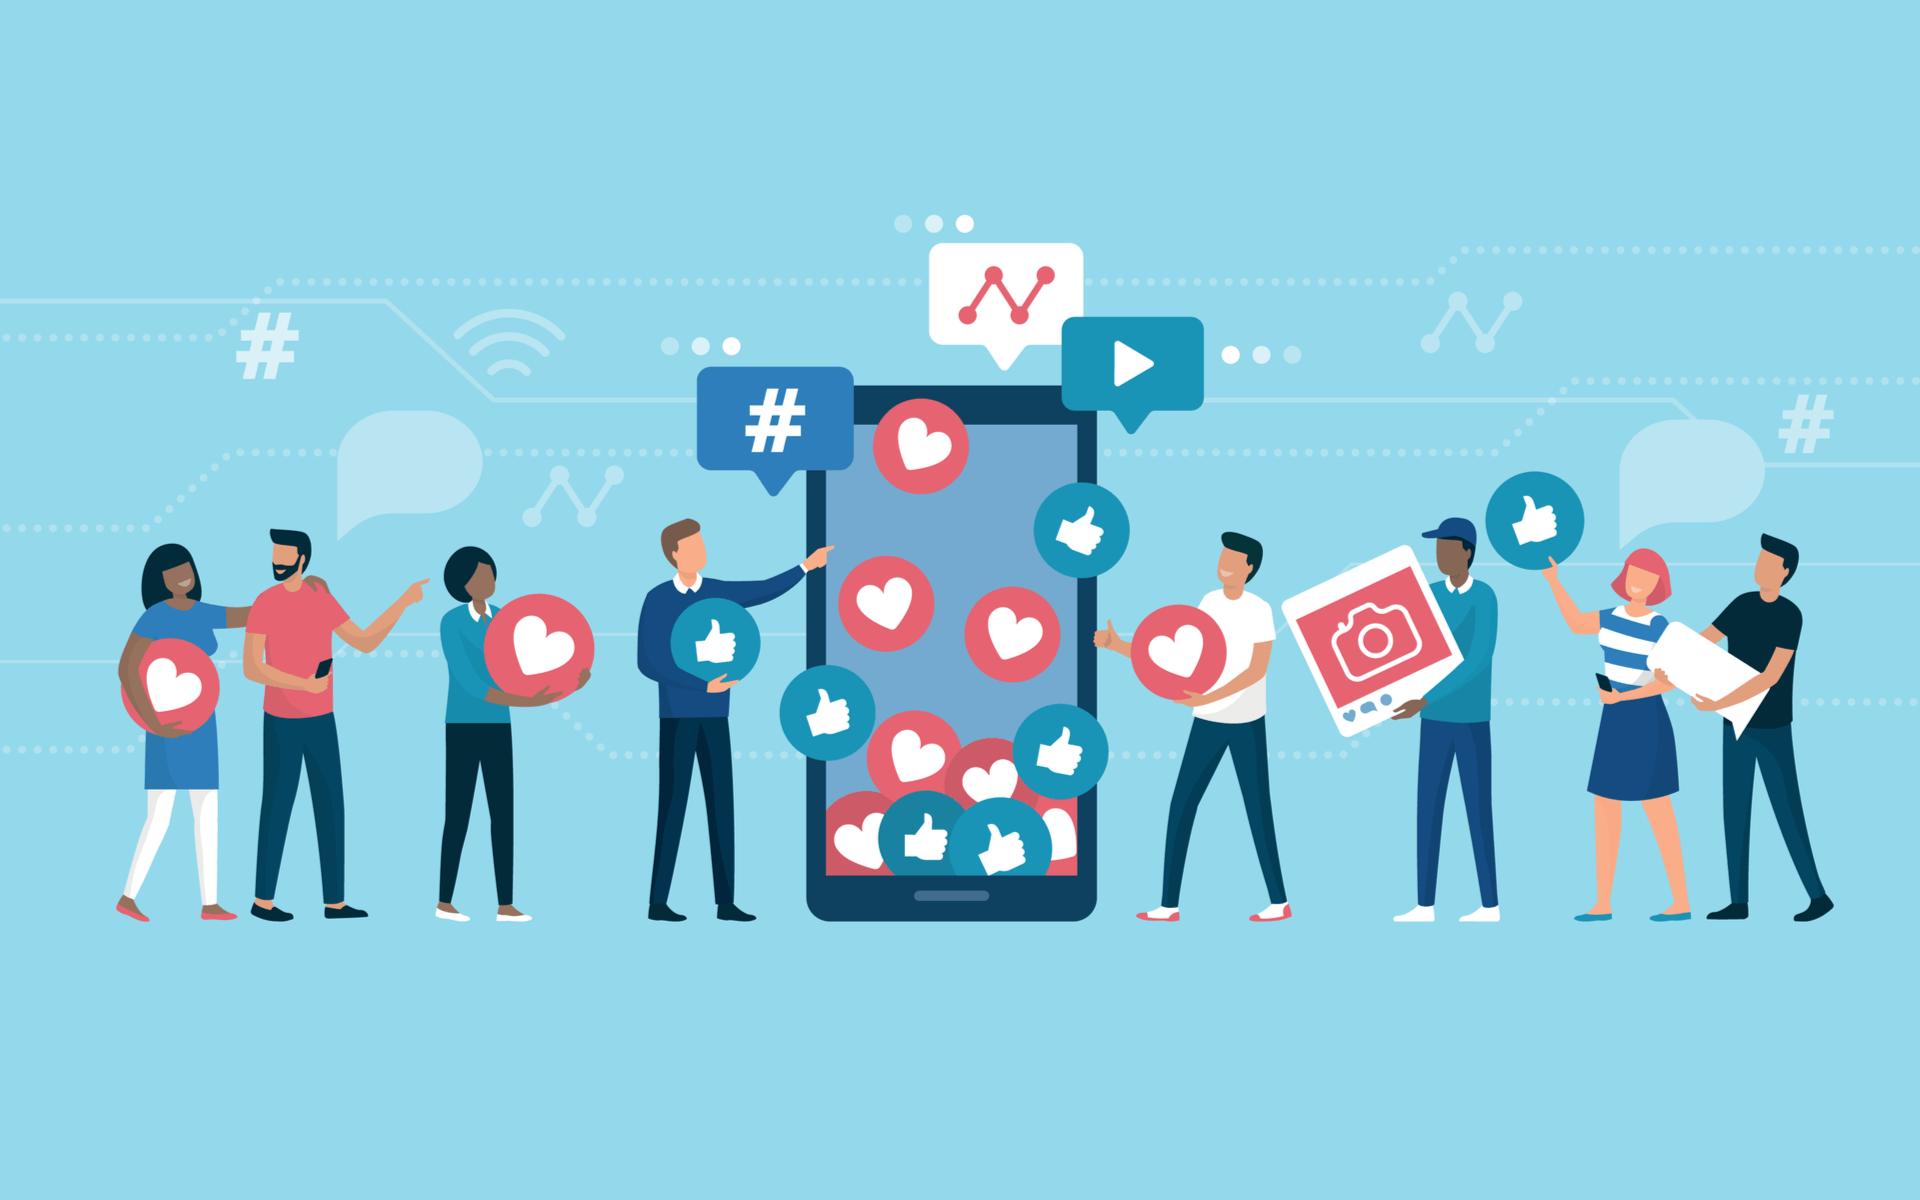 bg-social-media-community-1v-w1920h1200